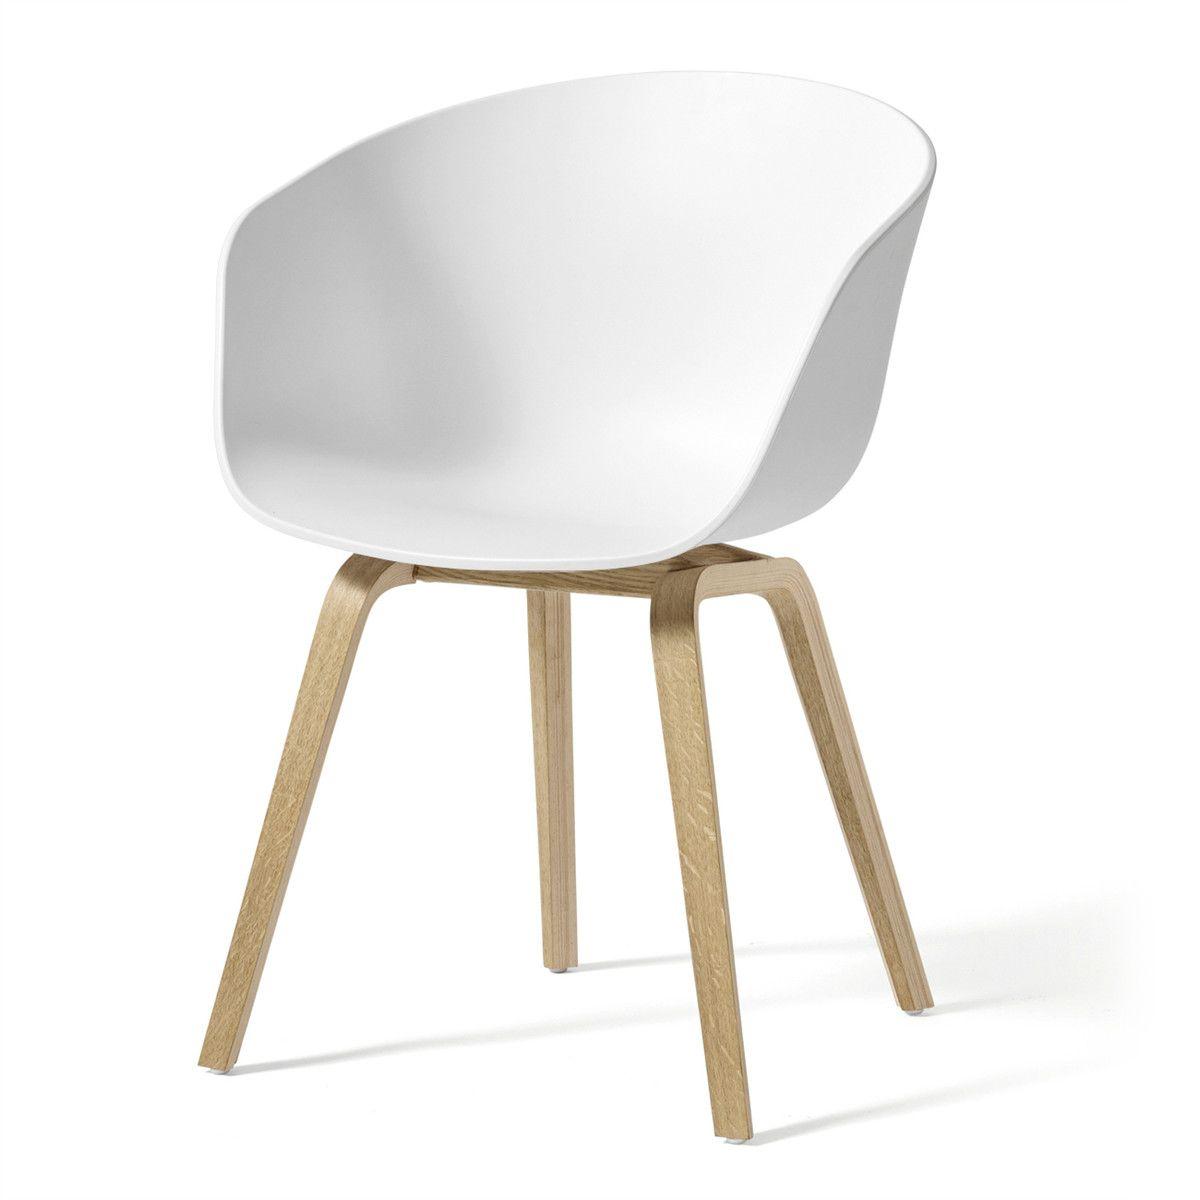 About A Chair Aac 22 Von Hay Connox Stuhle Skandinavische Stuhle Eiche